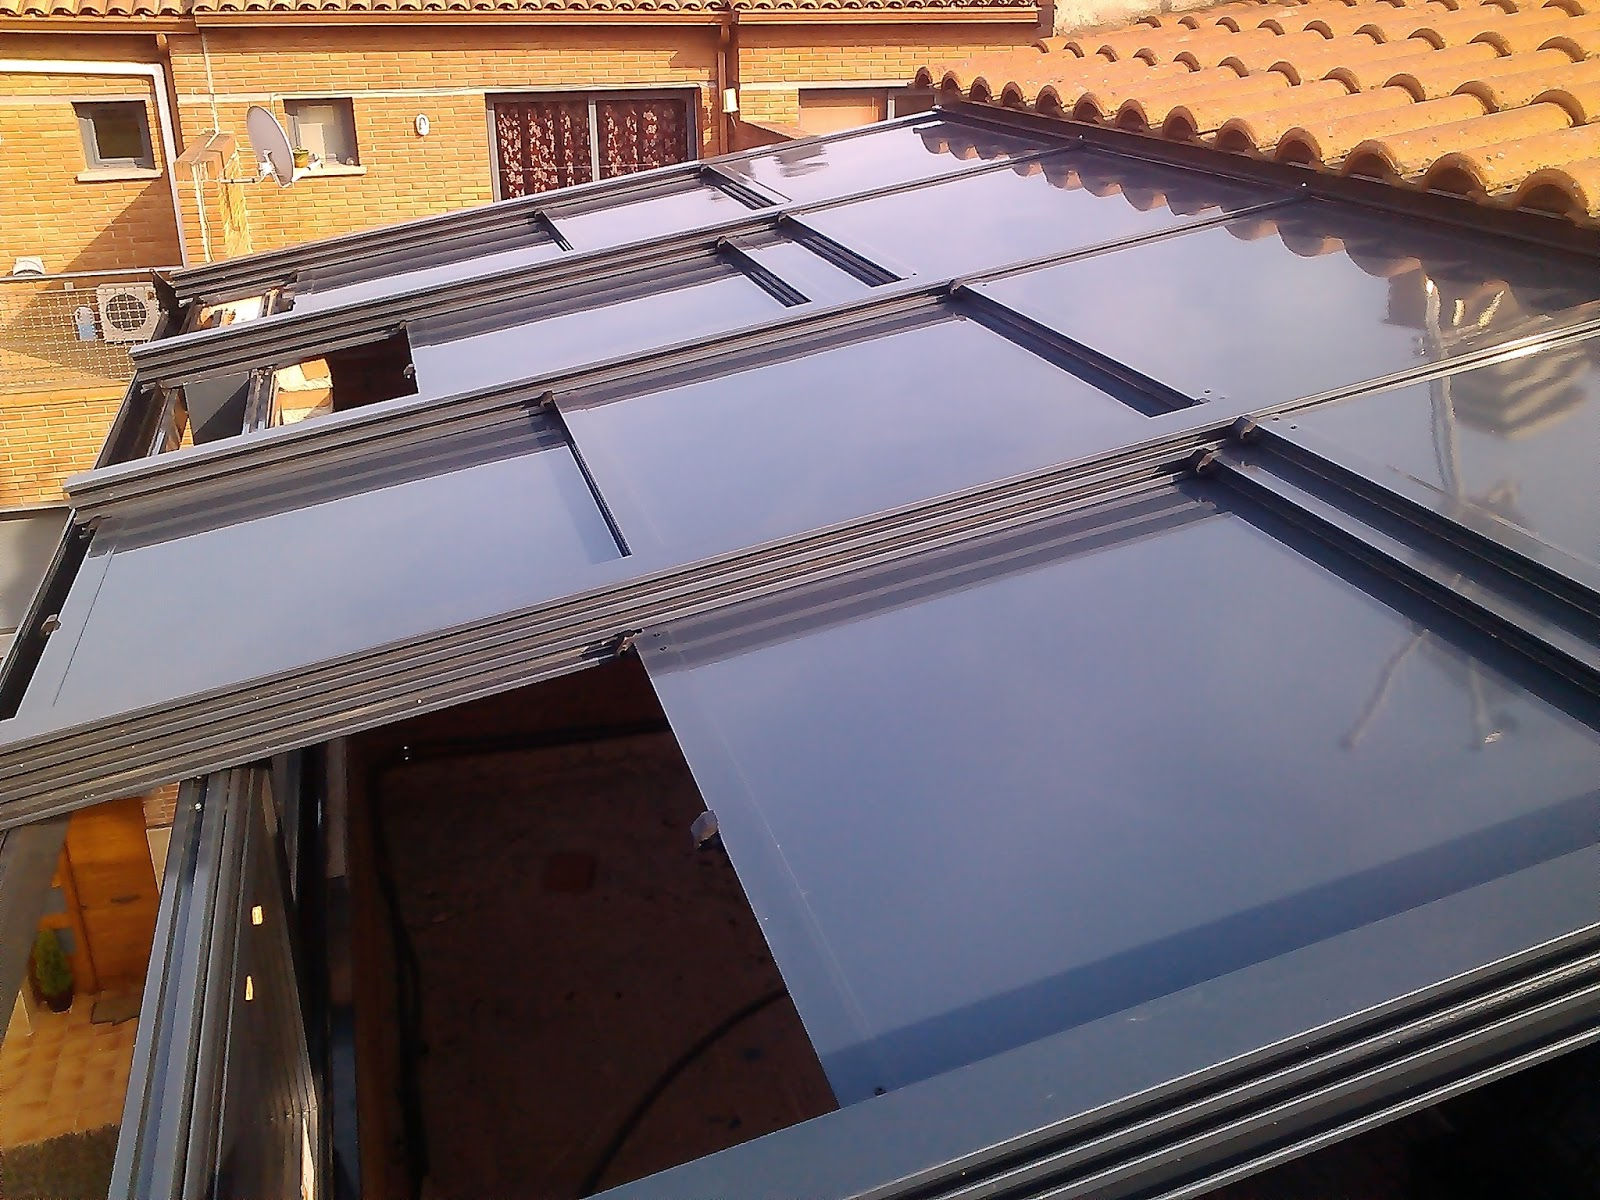 Aluminios arpo techo de aluminio - Techo de aluminio ...